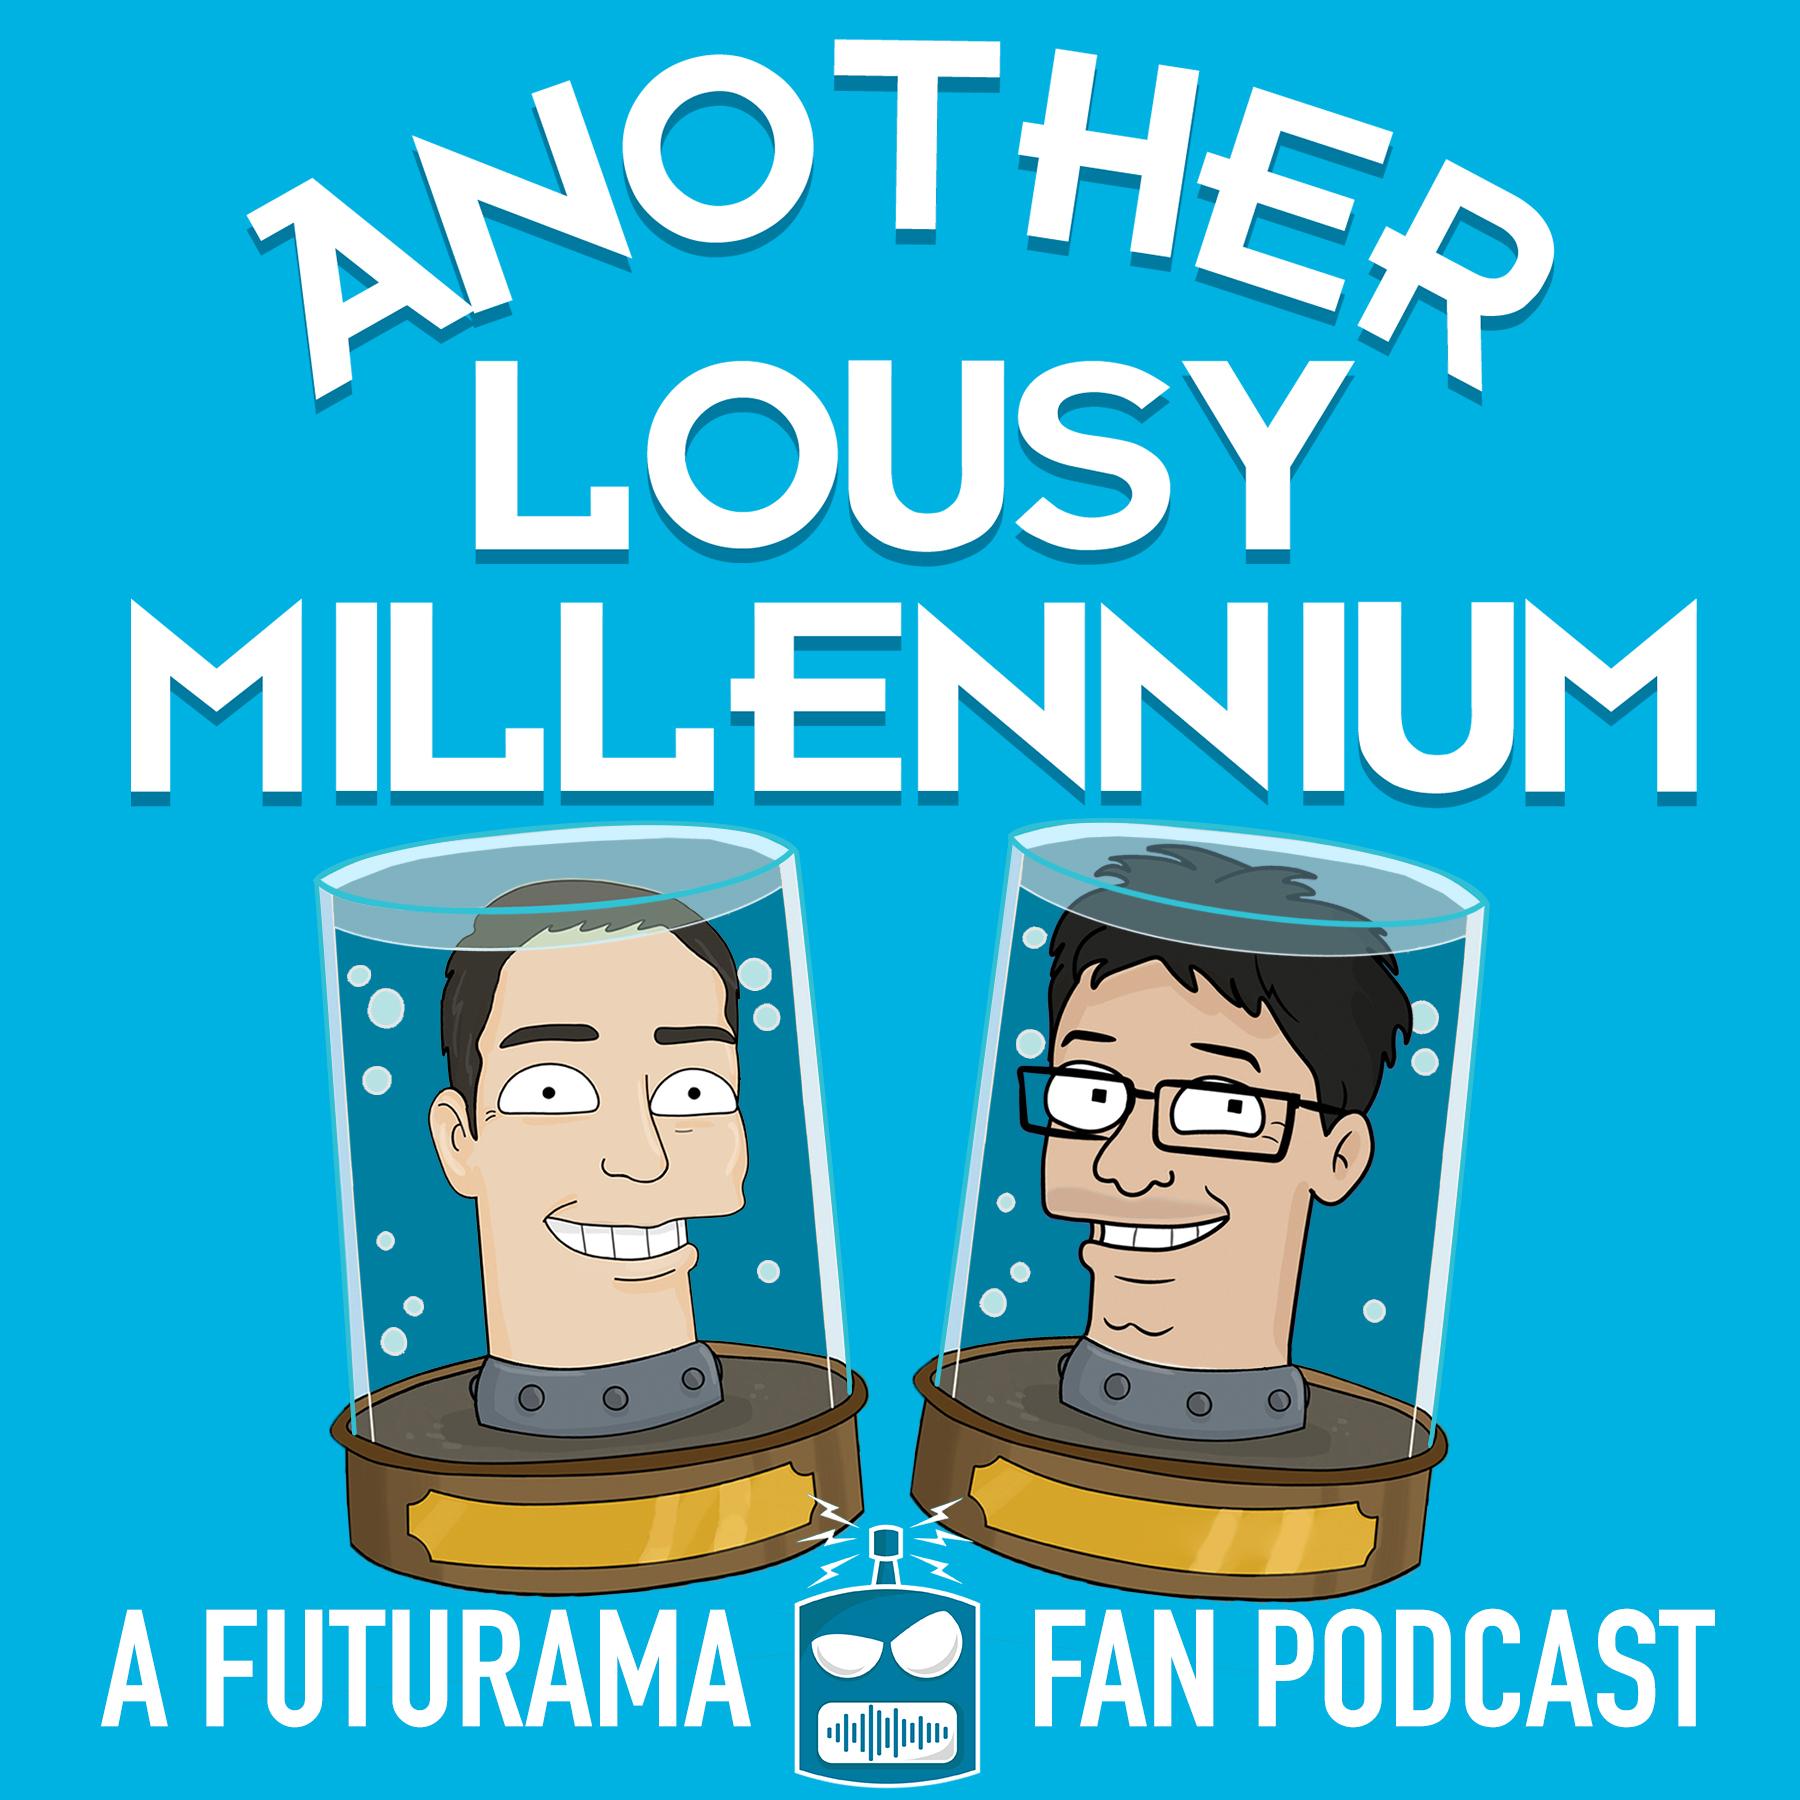 Another Lousy Millennium: A Futurama Fan Podcast